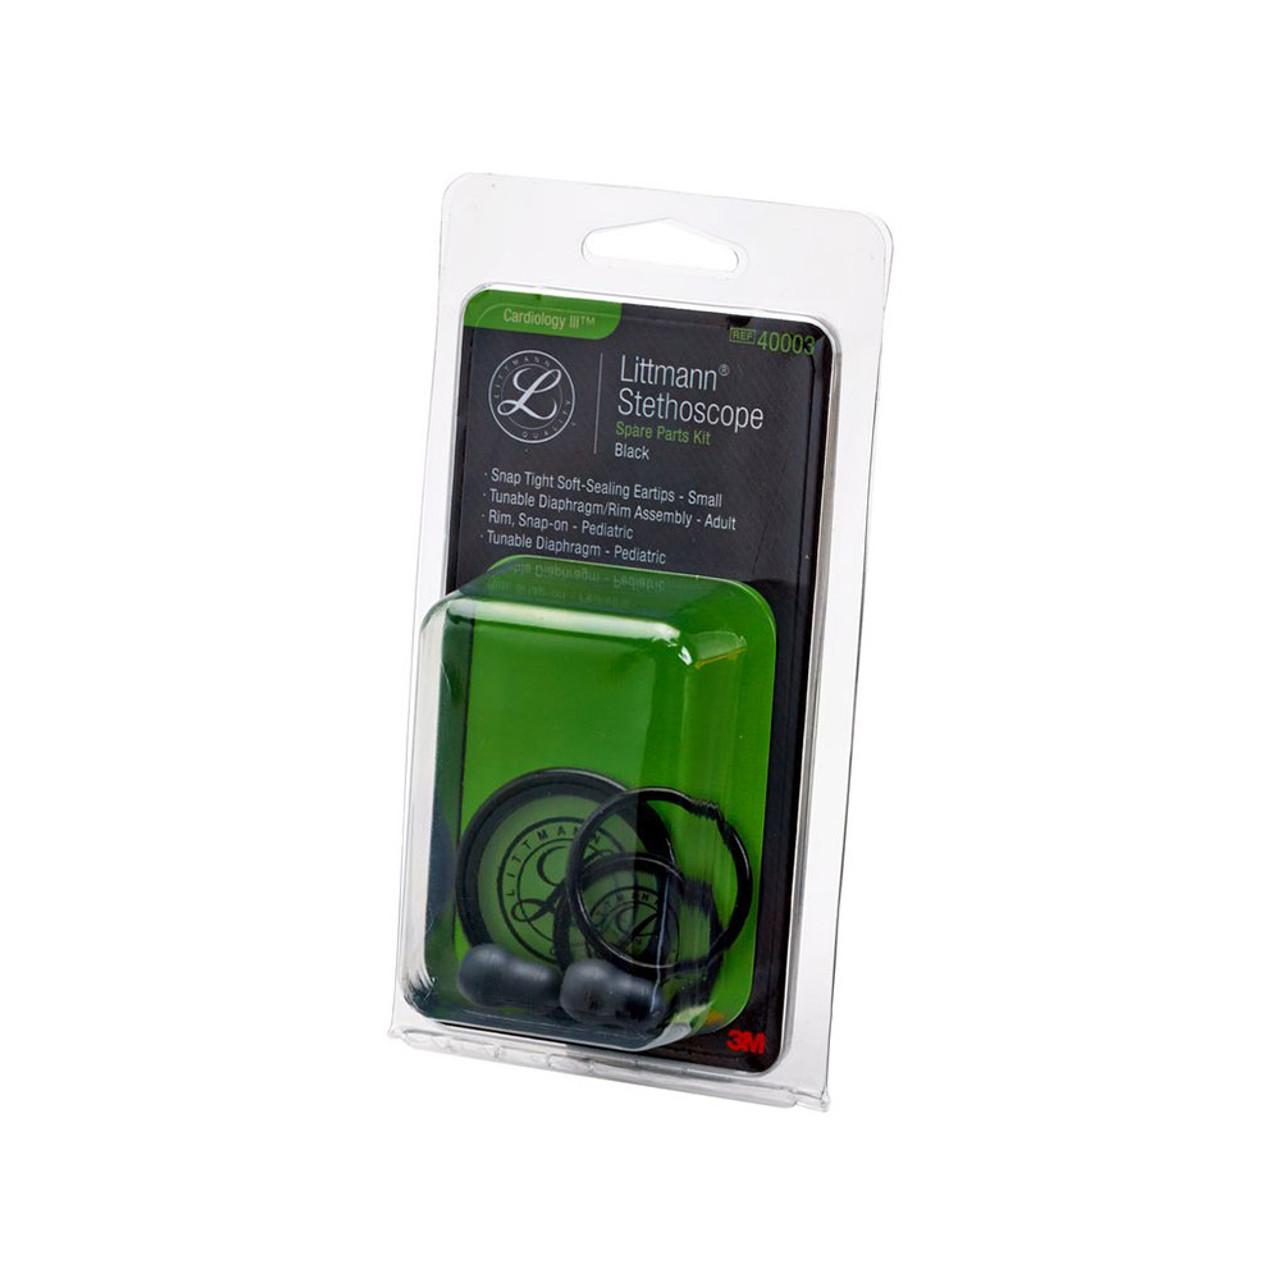 Littmann Stethoscope Spare Parts Kit, Cardiology III, Black, 40003